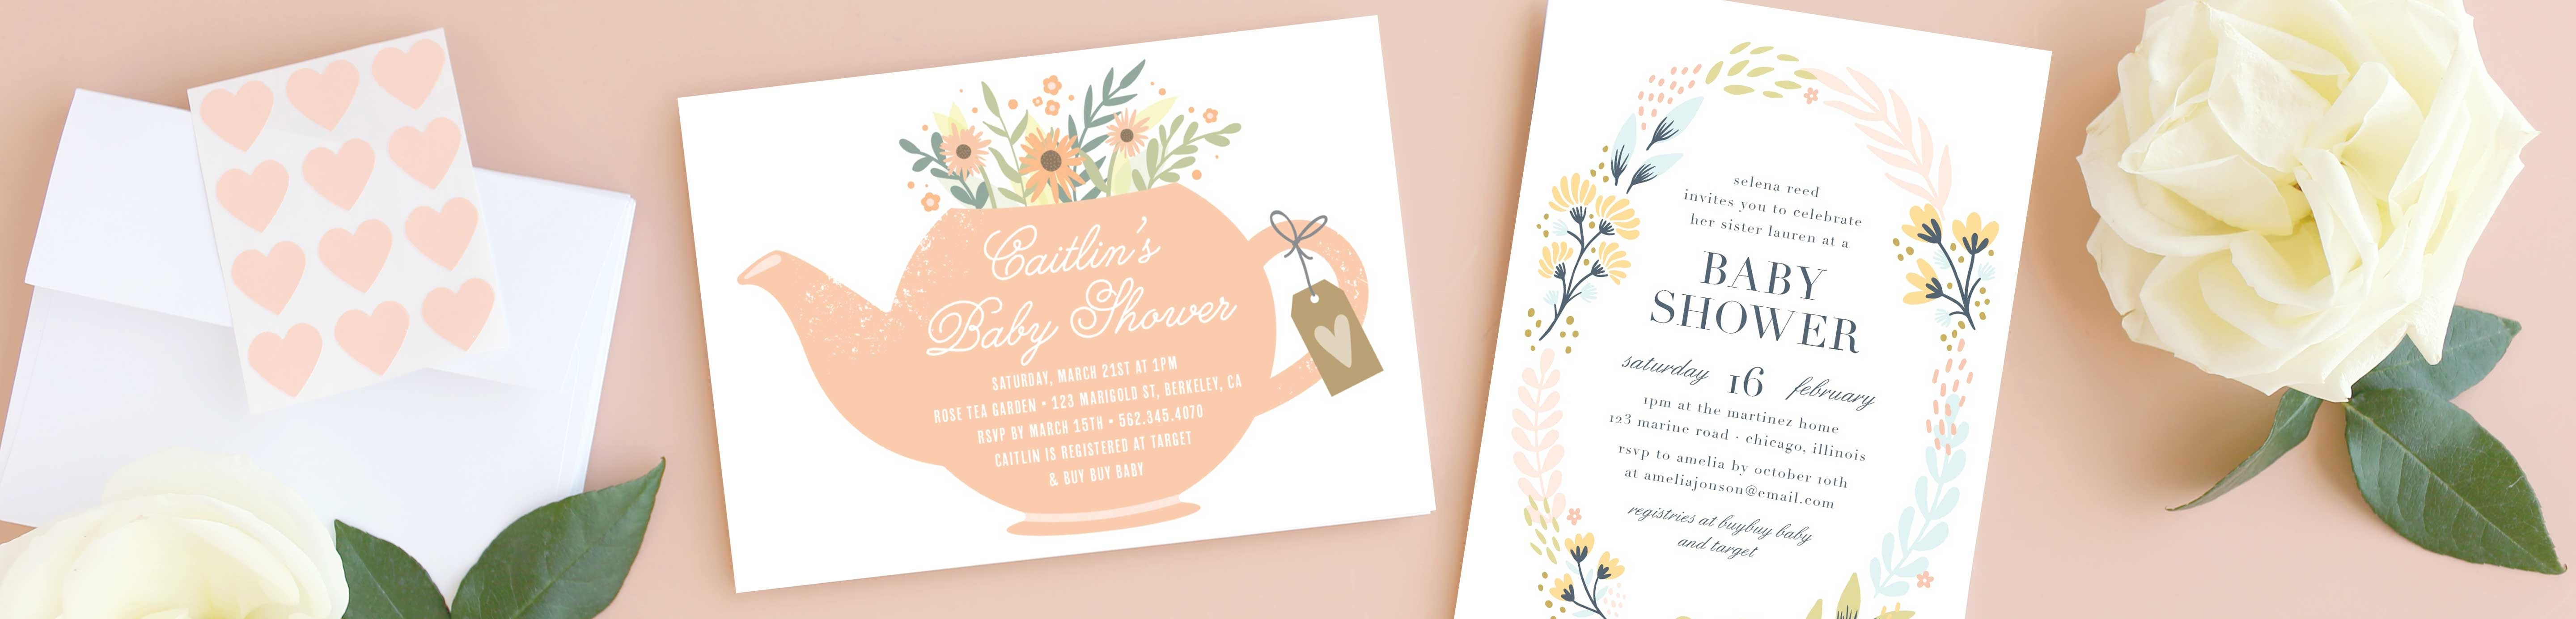 Tutu Excited Baby Shower Invitations